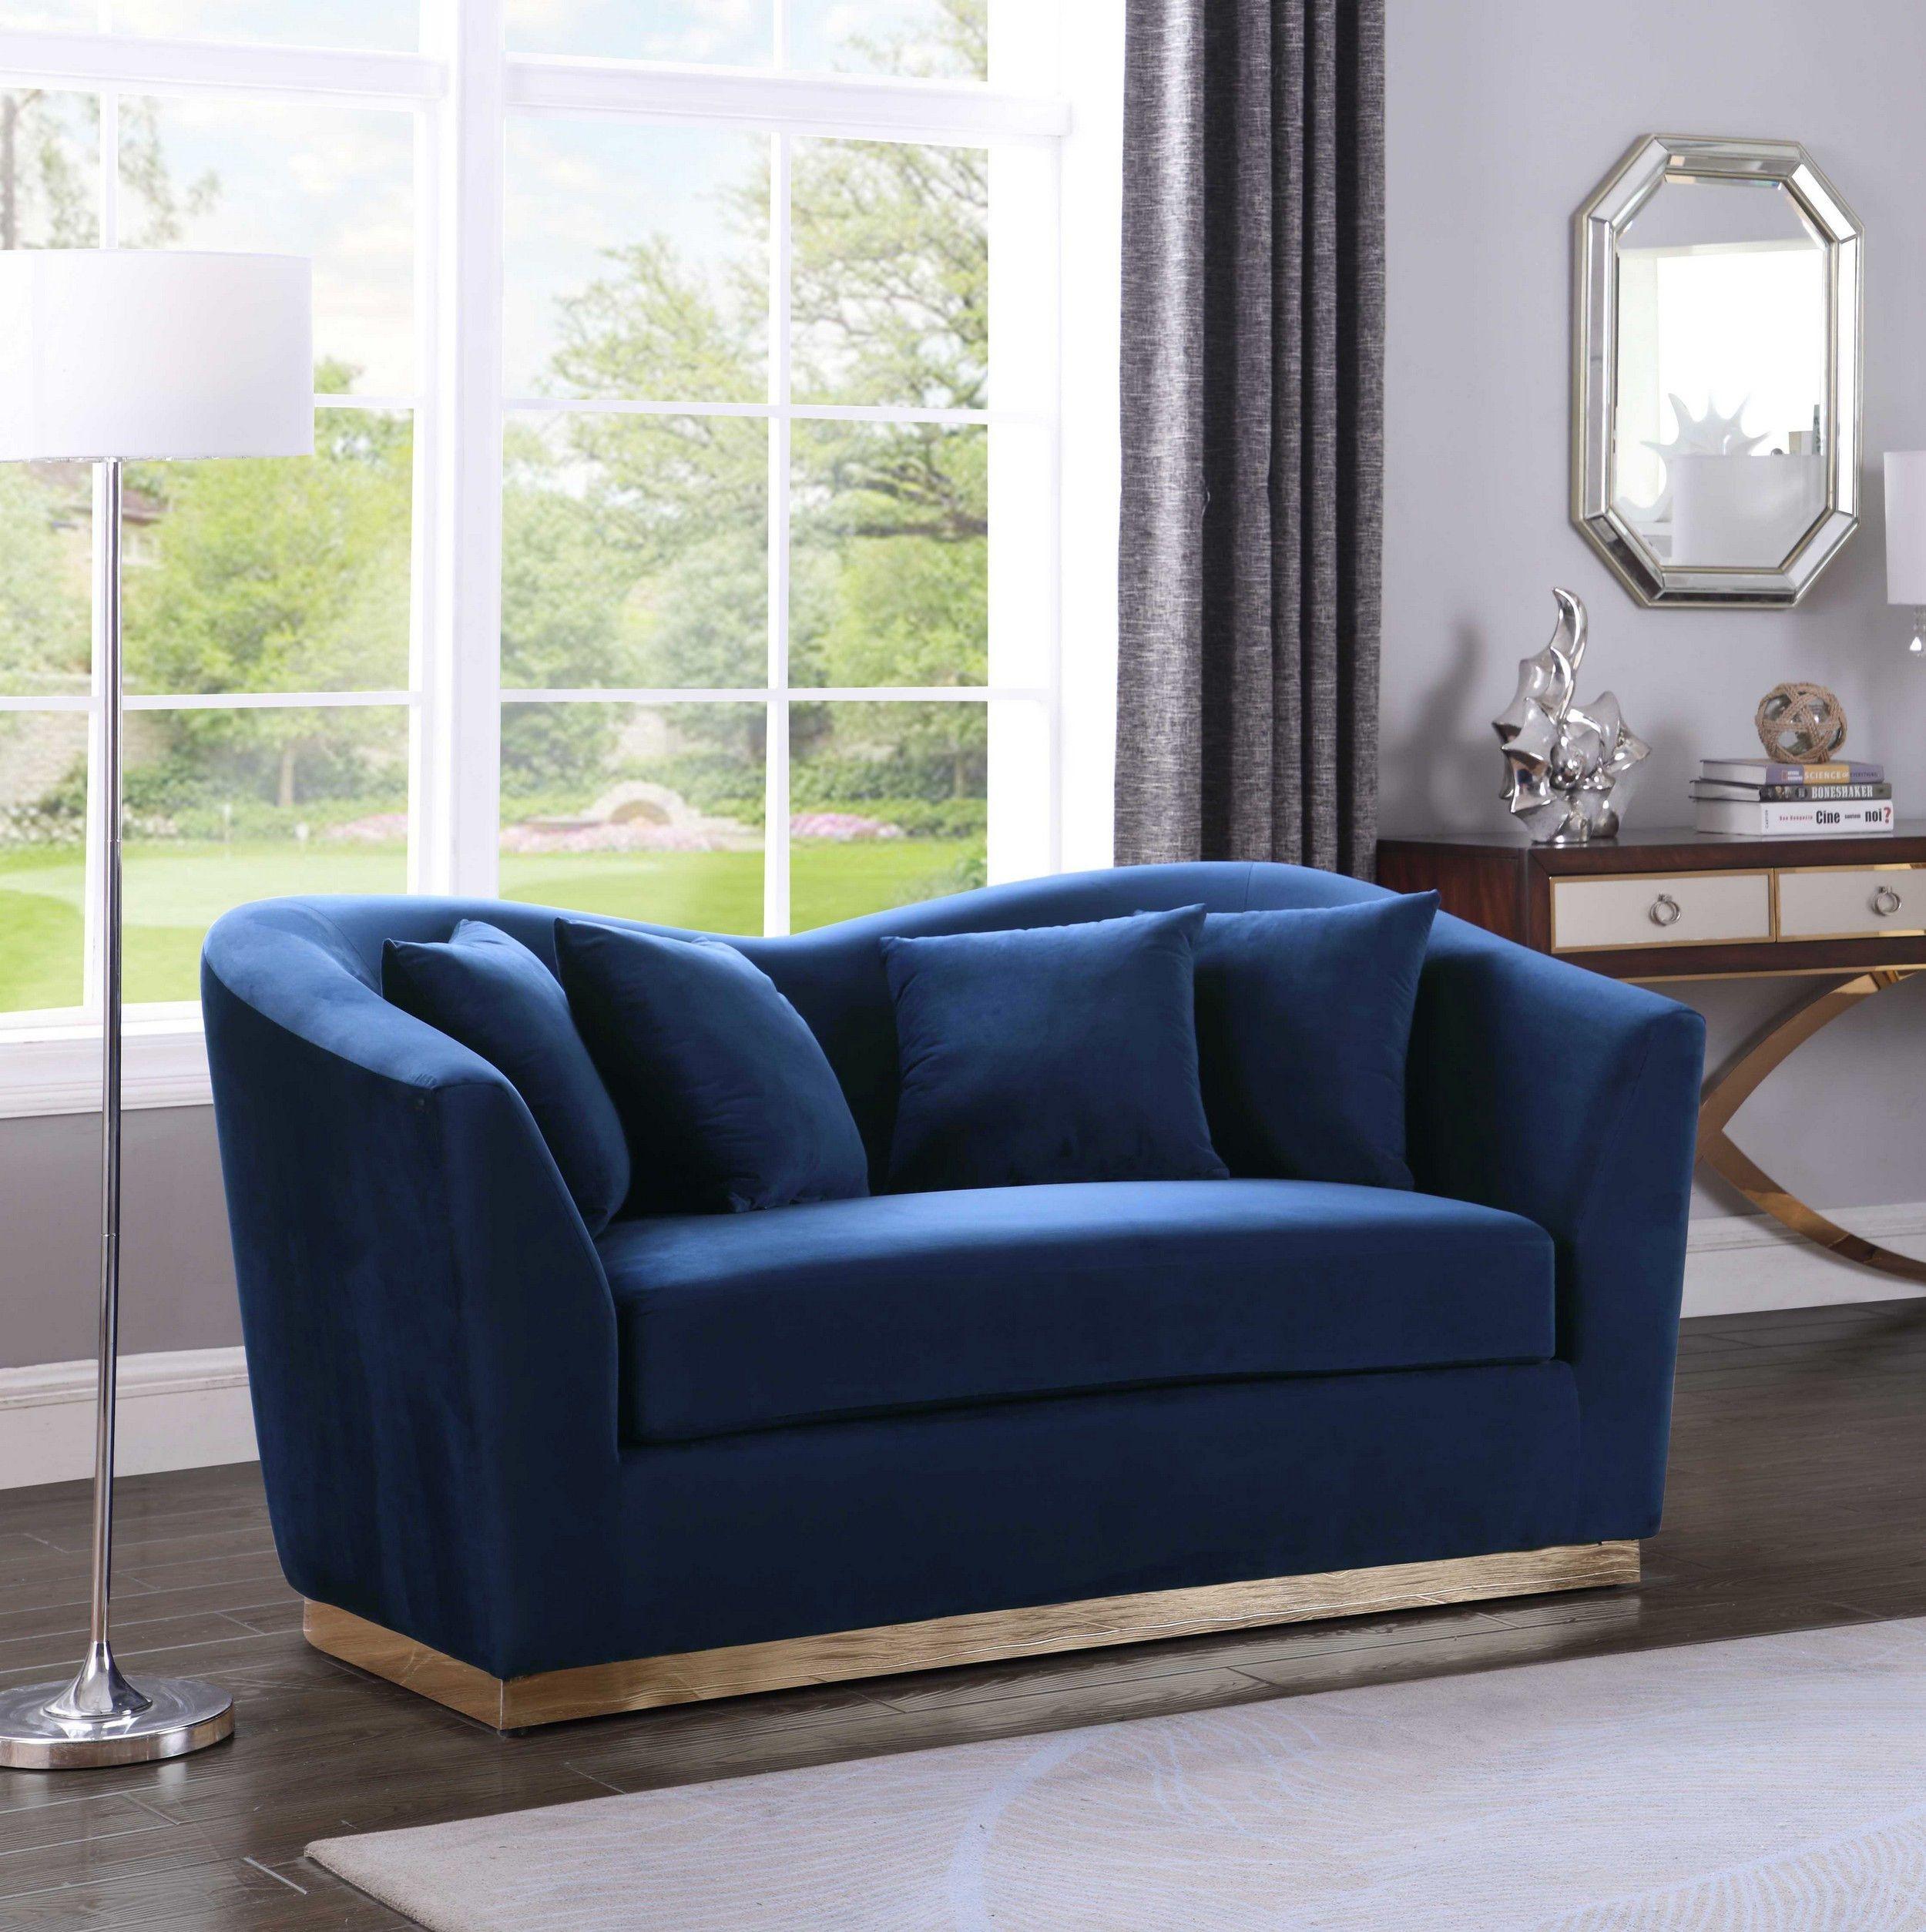 Arabella Navy Loveseat In 2020 Love Seat Sofa Sofa Design